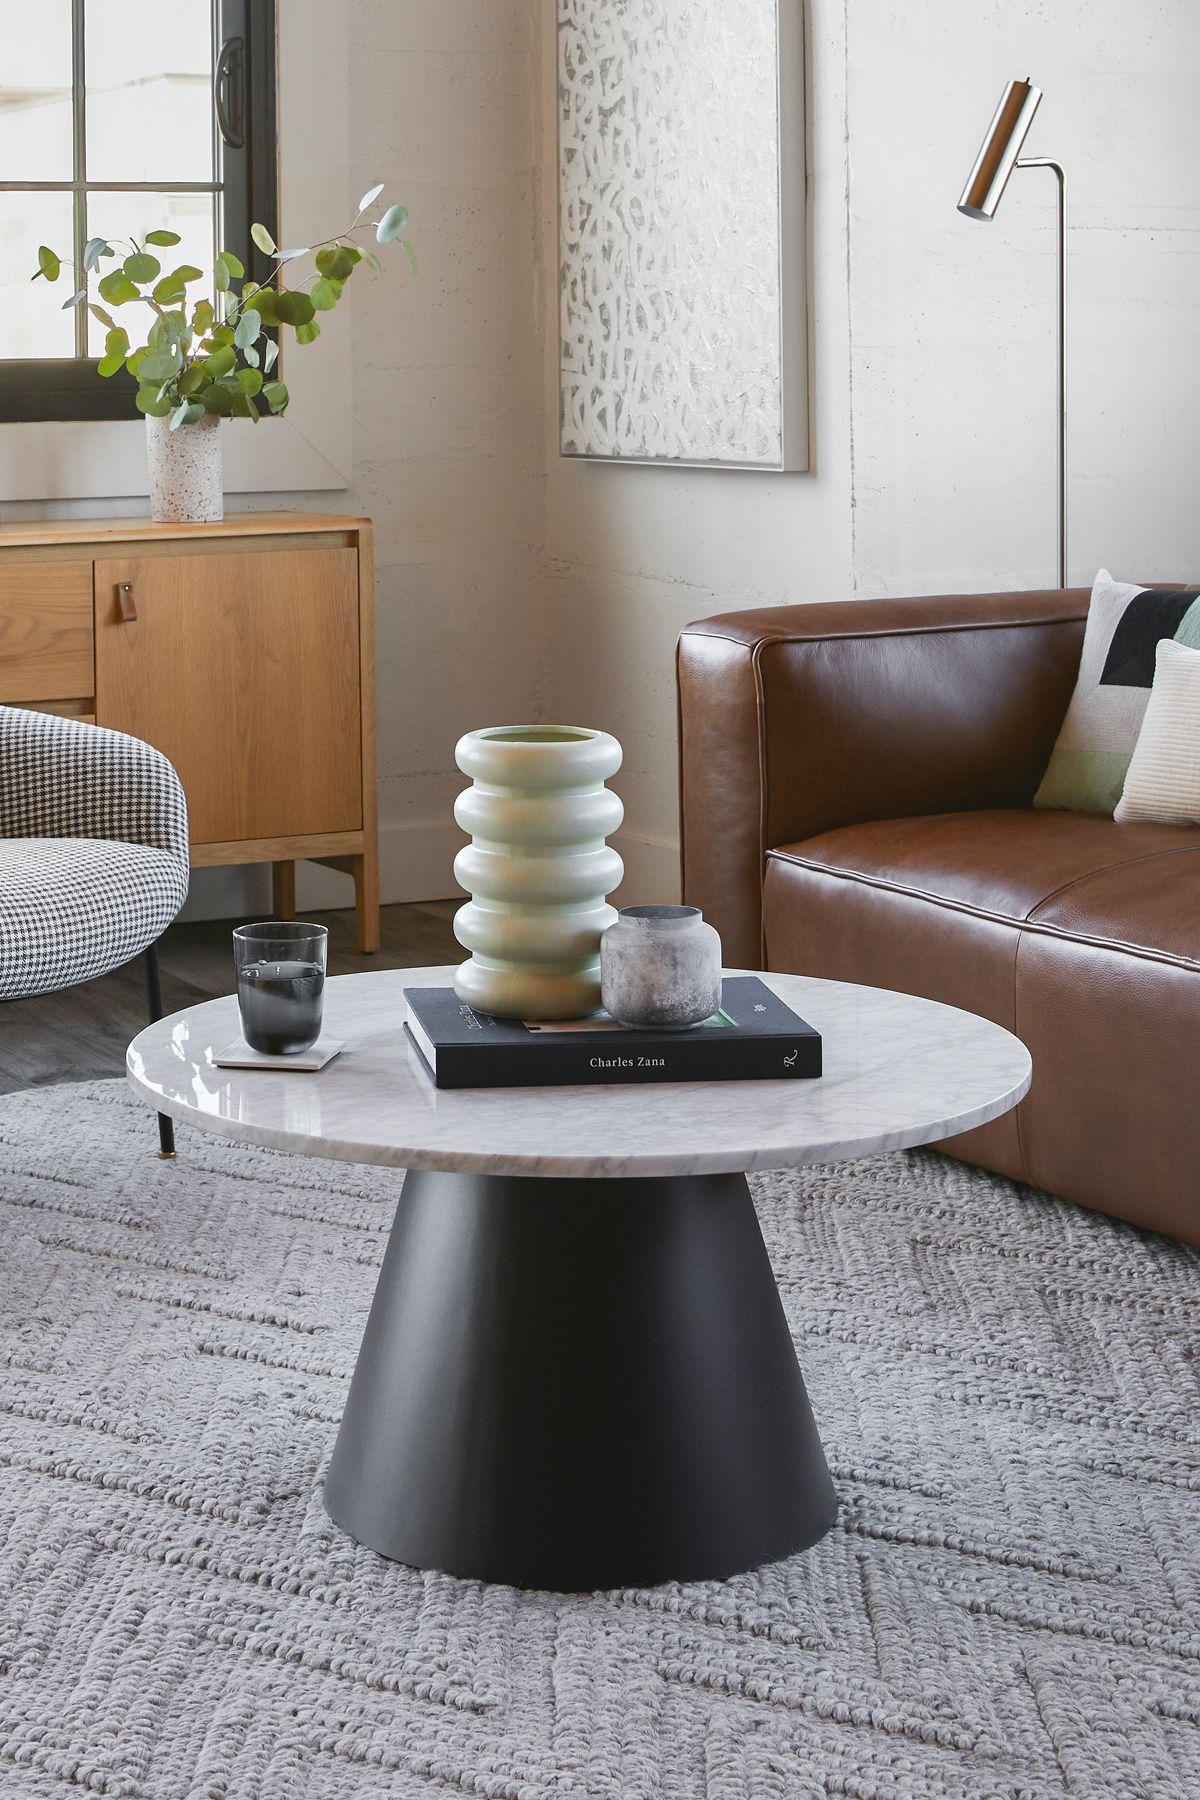 Tromso Black Coffee Table Coffee Table Black Coffee Tables Table [ 1800 x 1200 Pixel ]